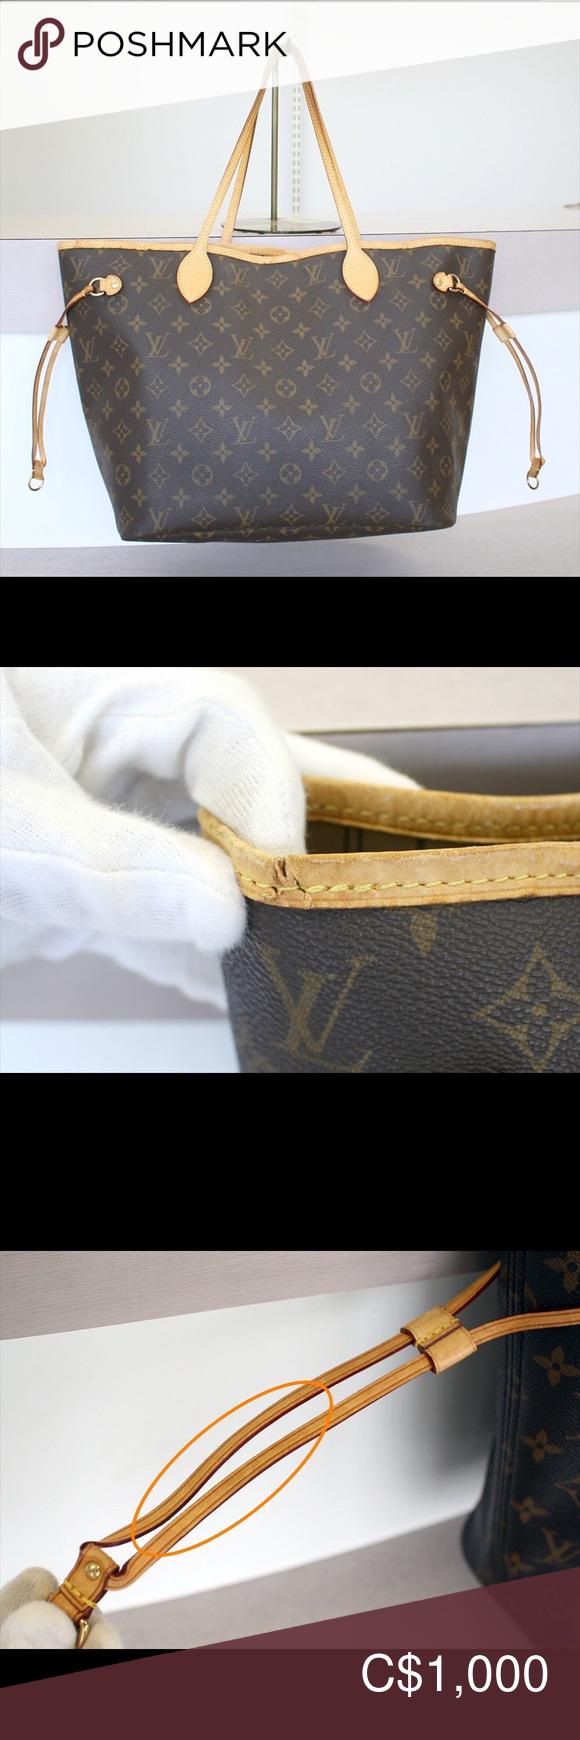 Louis Vuitton Neverfull Mm Monogram Bag No 1050 Louis Vuitton Neverfull Mm Monogram Bag Neverfull Mm Monogram